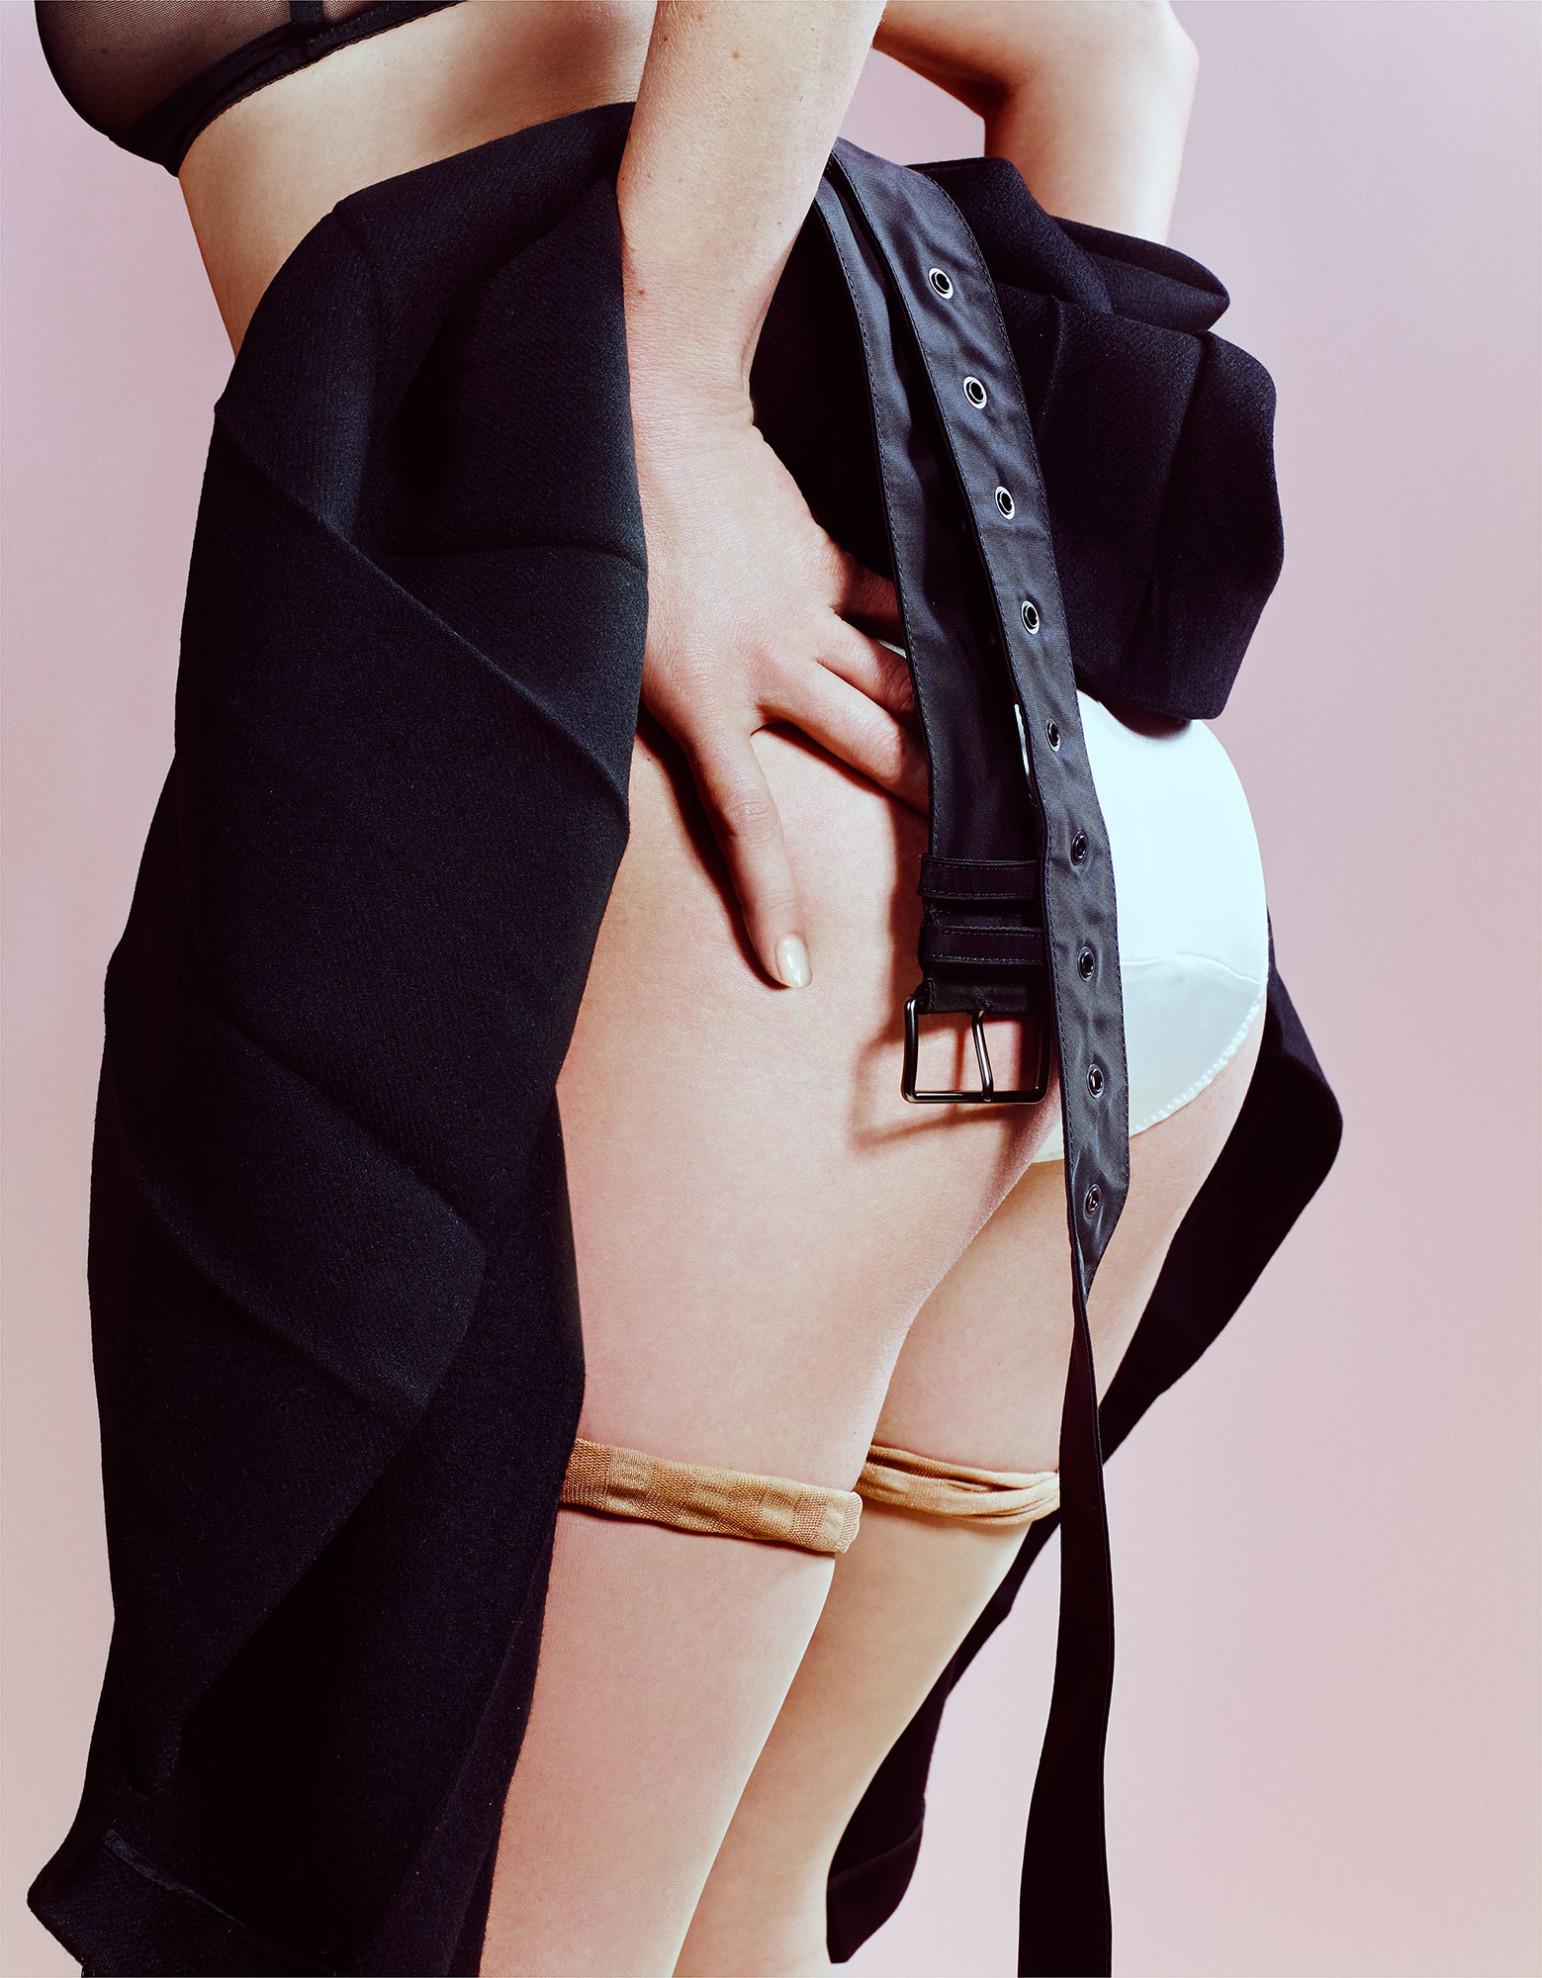 Kate-Moss-Naked-8